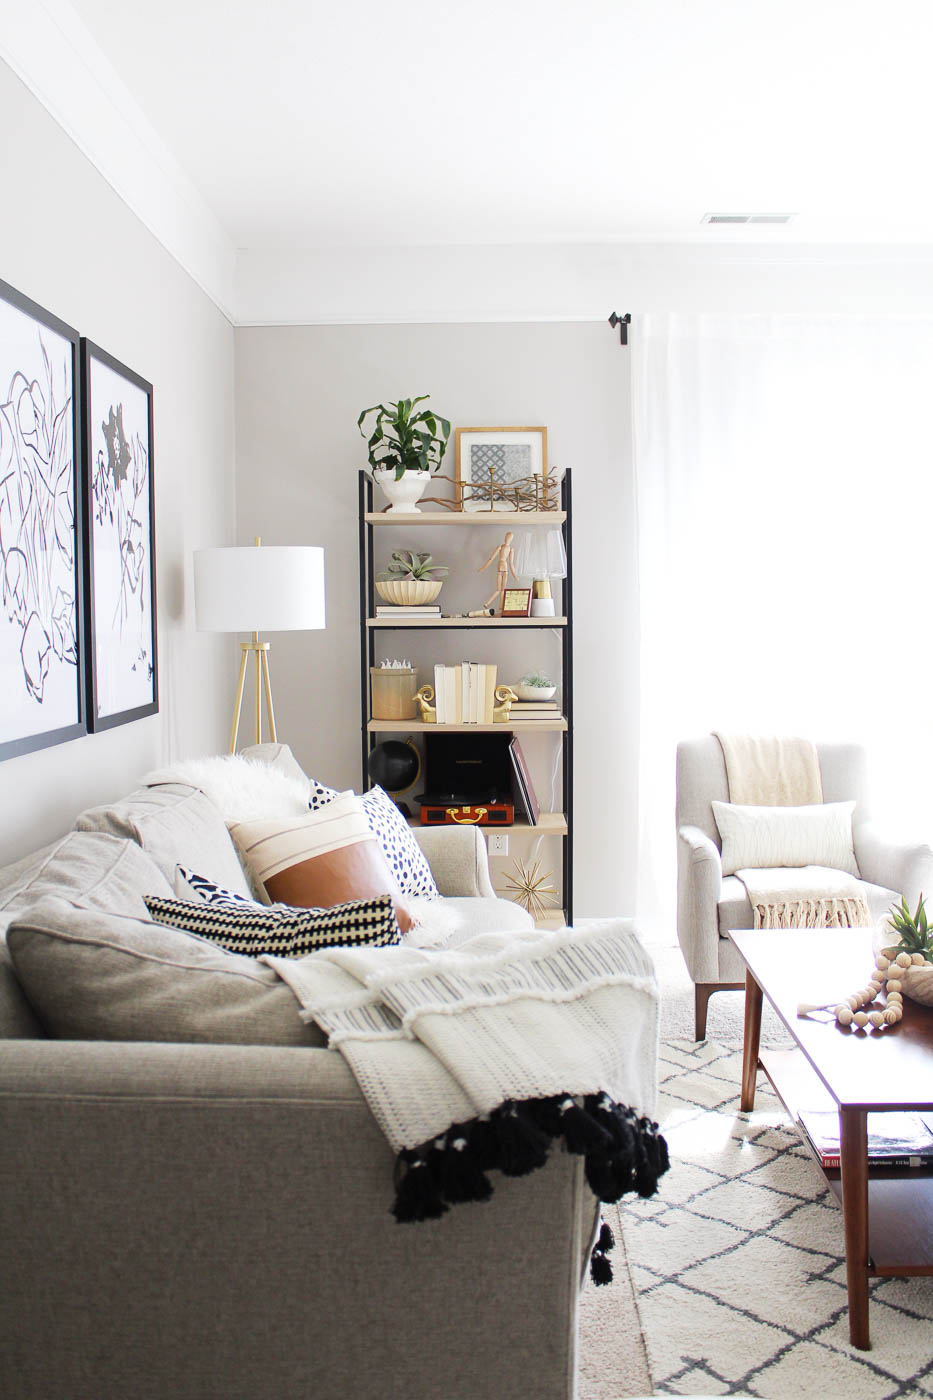 cozy-quarters-ohio-natural-light-photography-studio-lifestyle-photographer-13.jpg